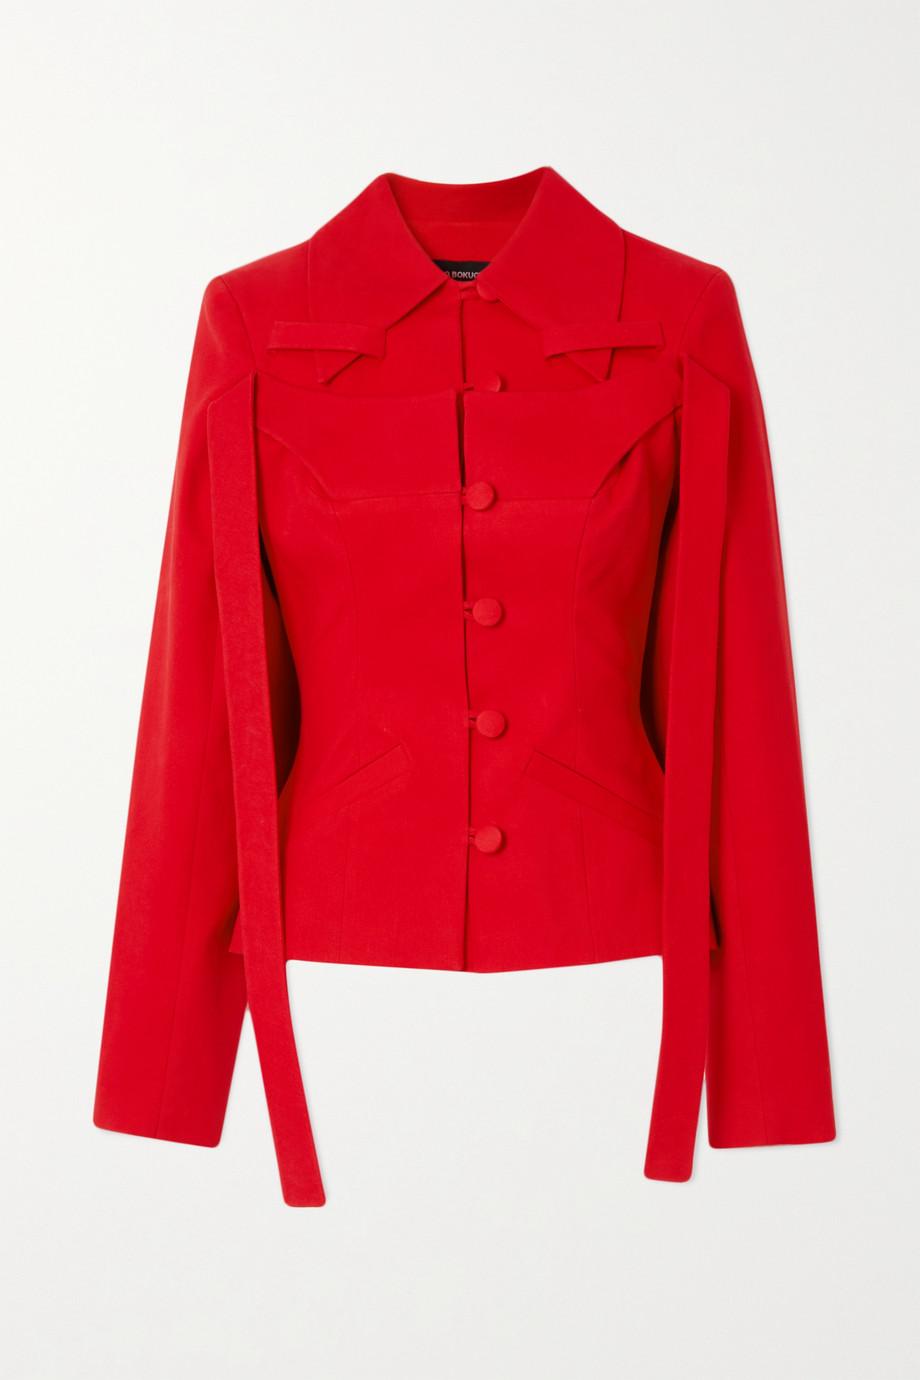 Lado Bokuchava Draped paneled cotton-twill blazer